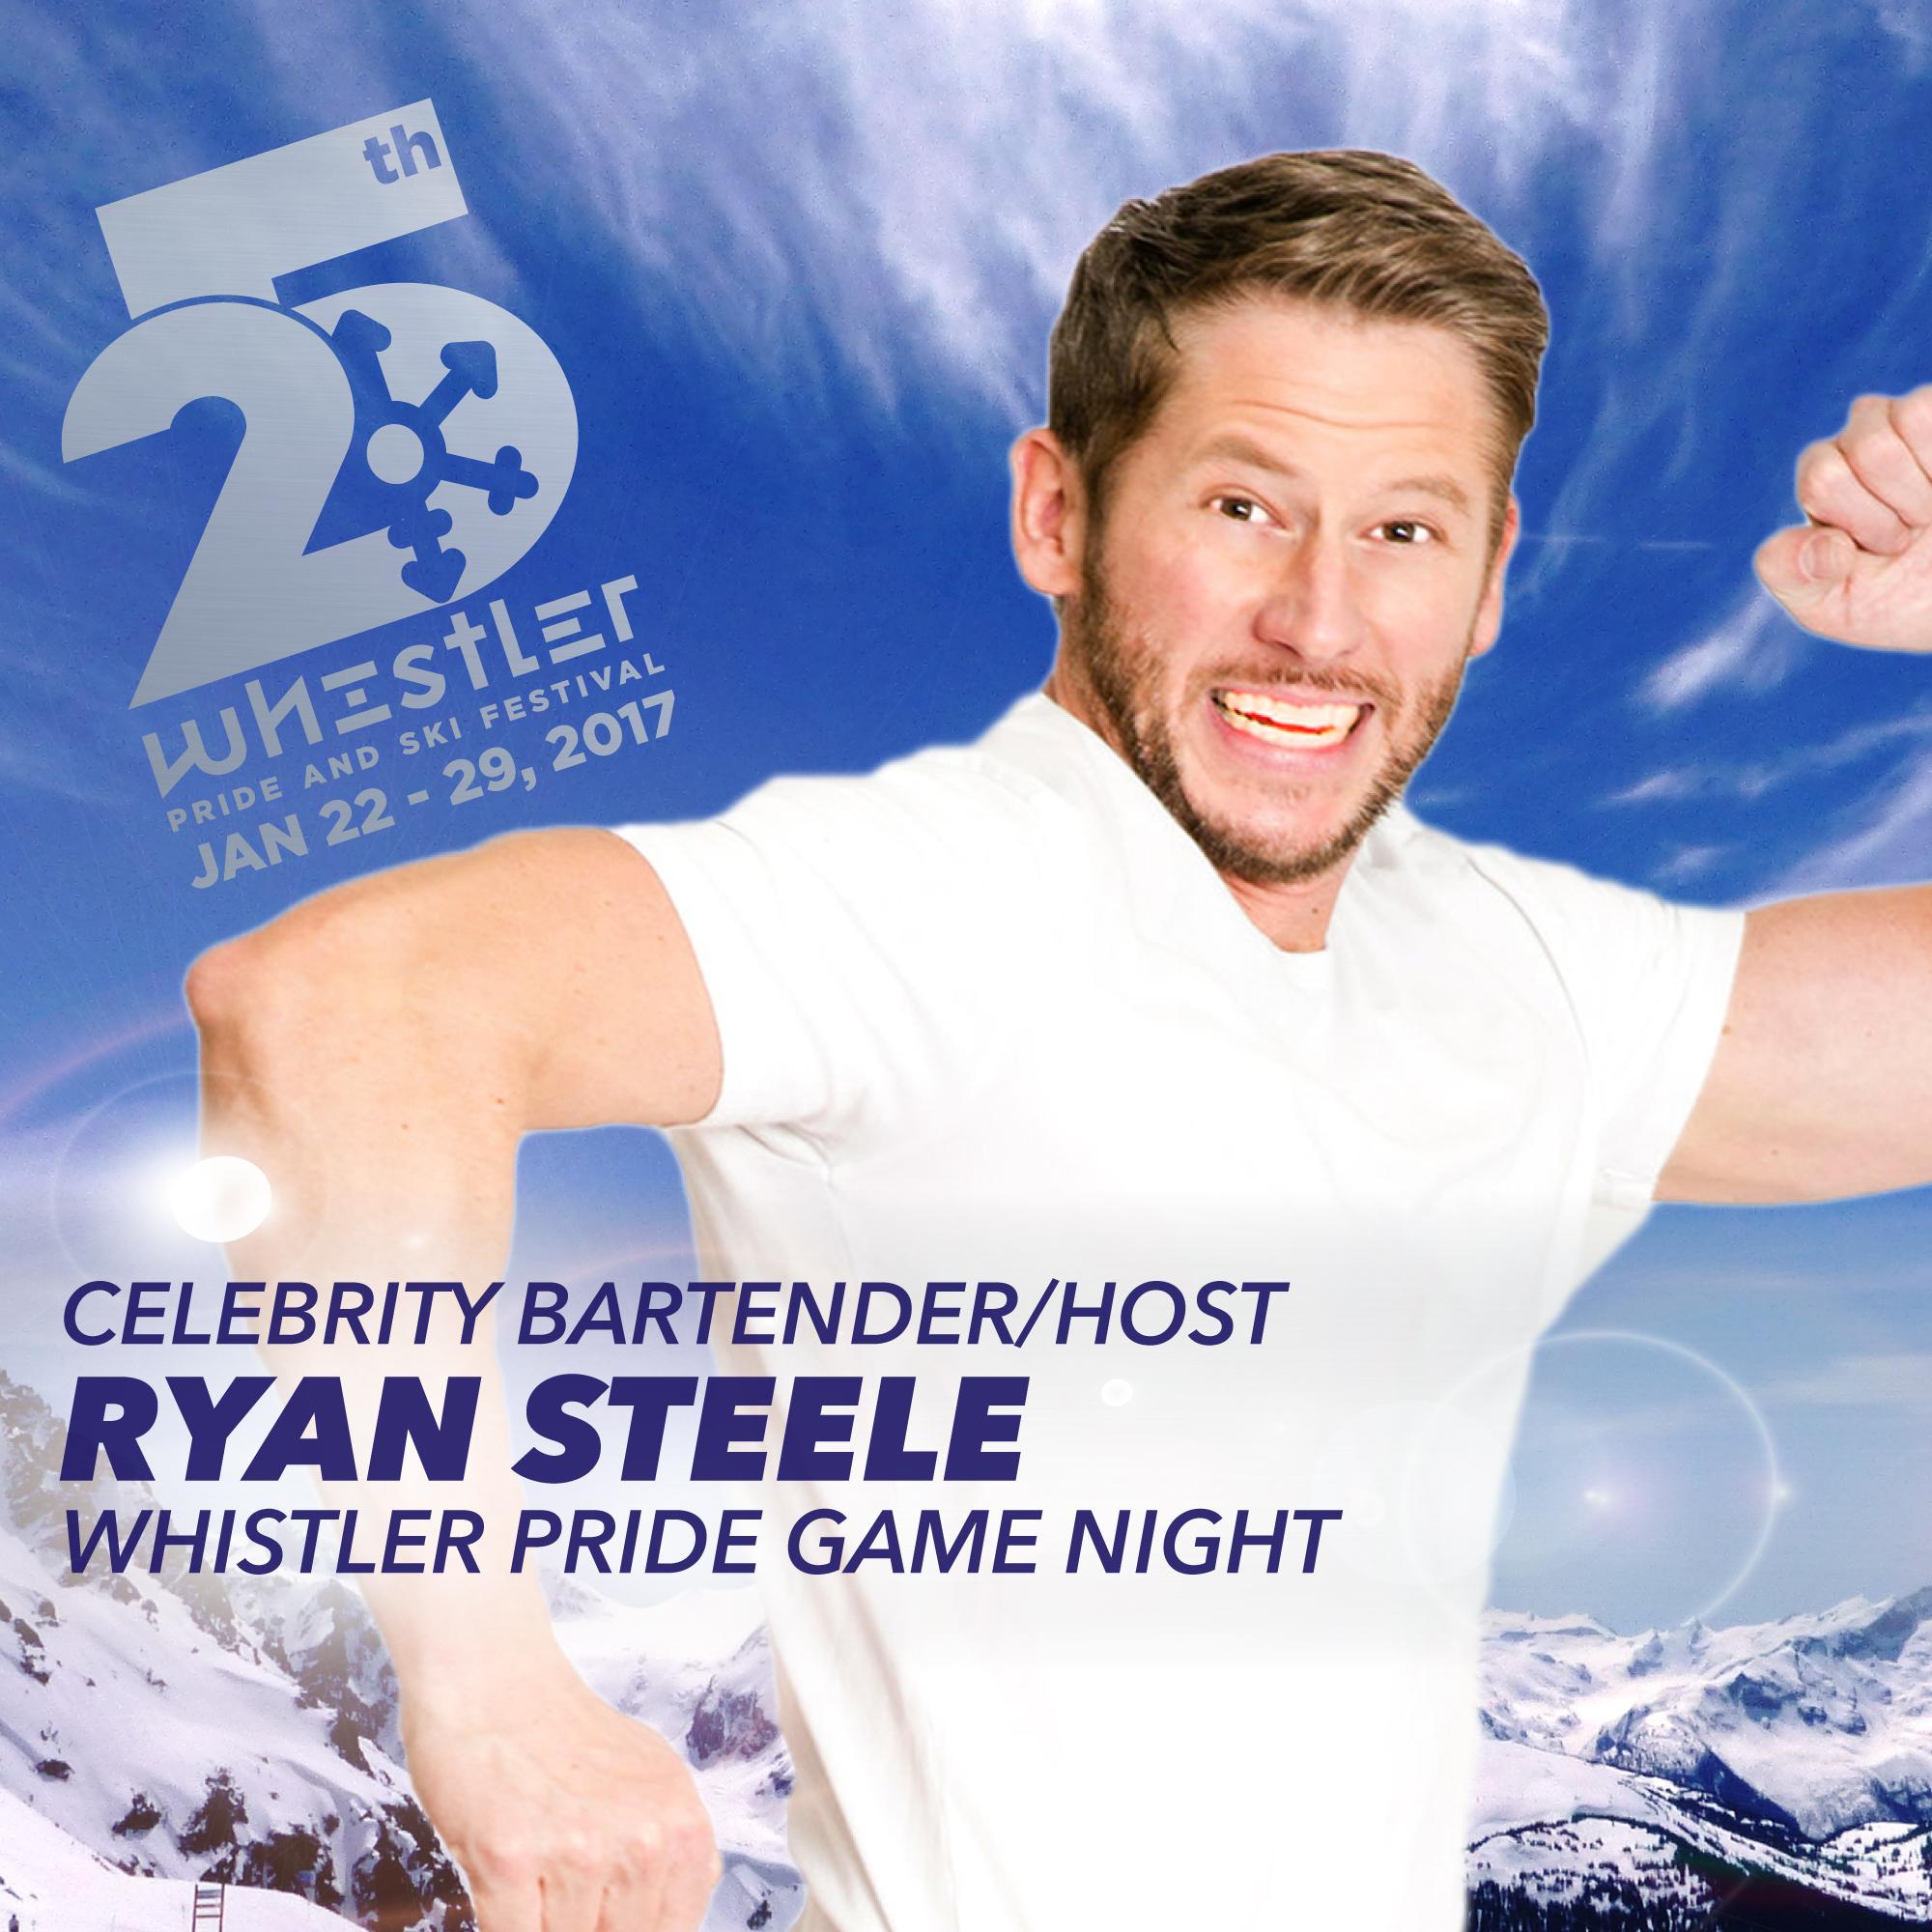 Ryan Steele Celebrity bartender and Game Host at Whistler Pride and Ski Festival